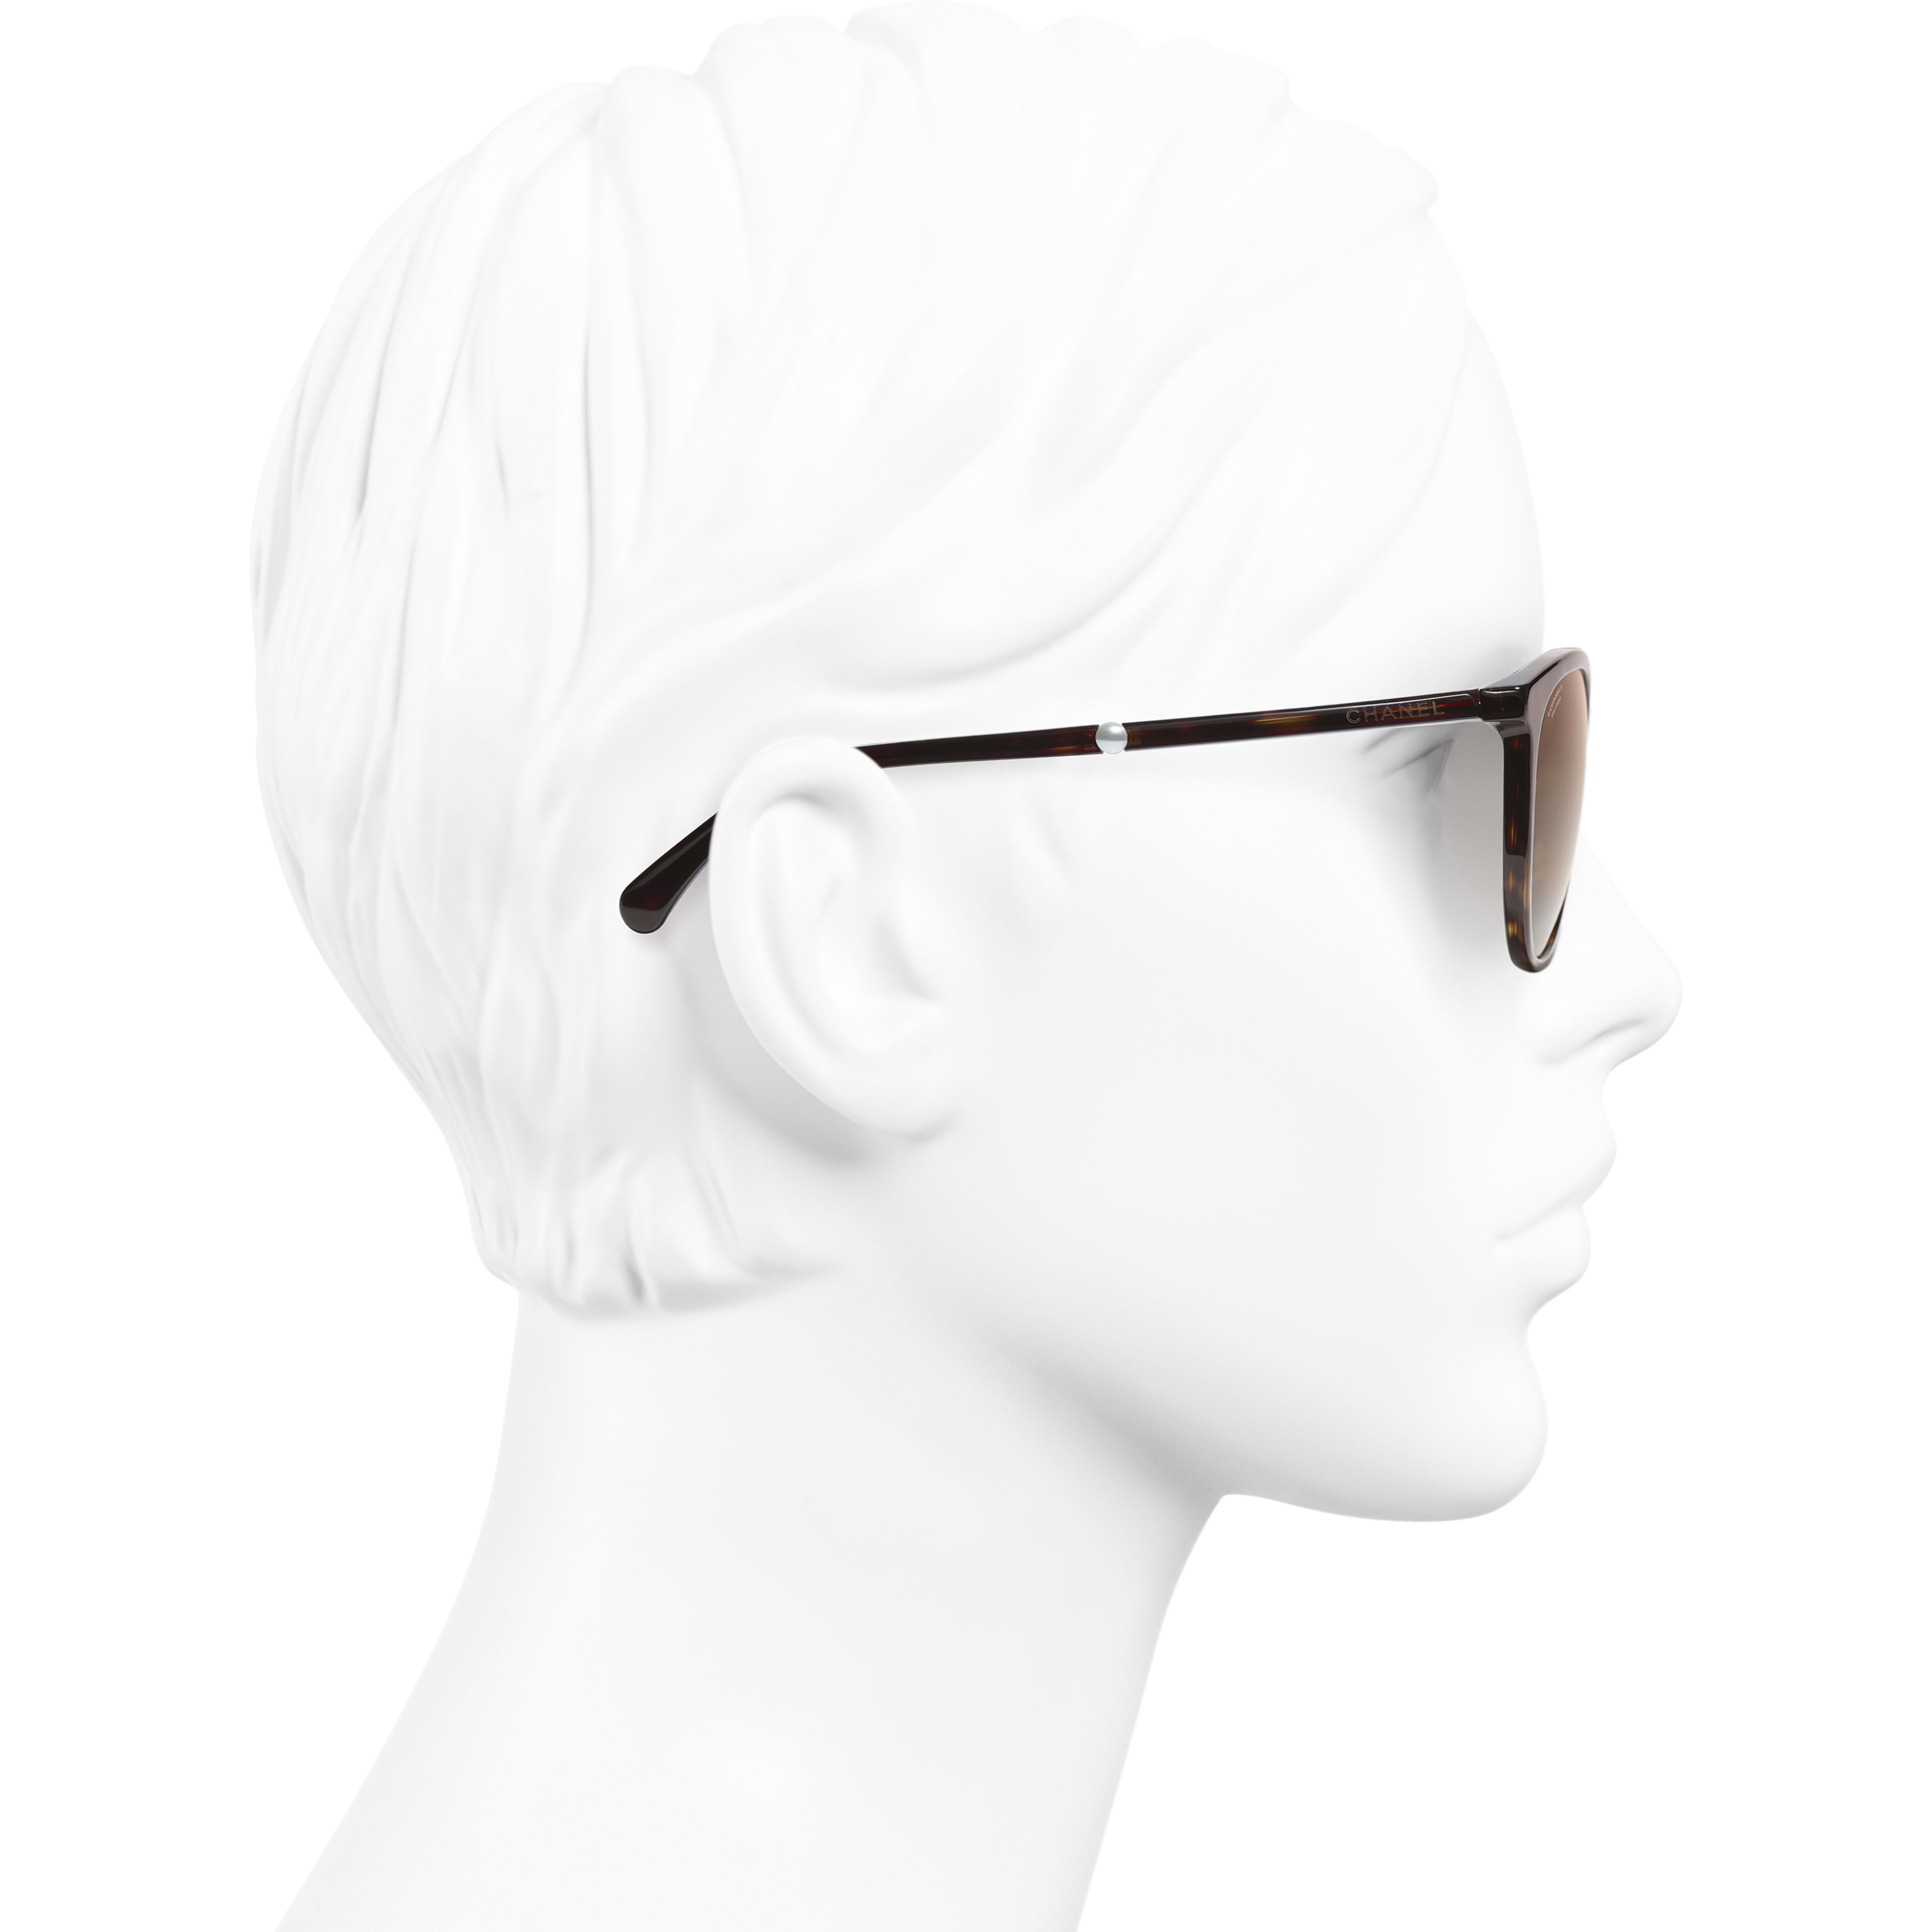 aac04703fd6 ... Butterfly Sunglasses - Dark Tortoise - Acetate   Imitation Pearls -  Polarized Lenses - Worn side